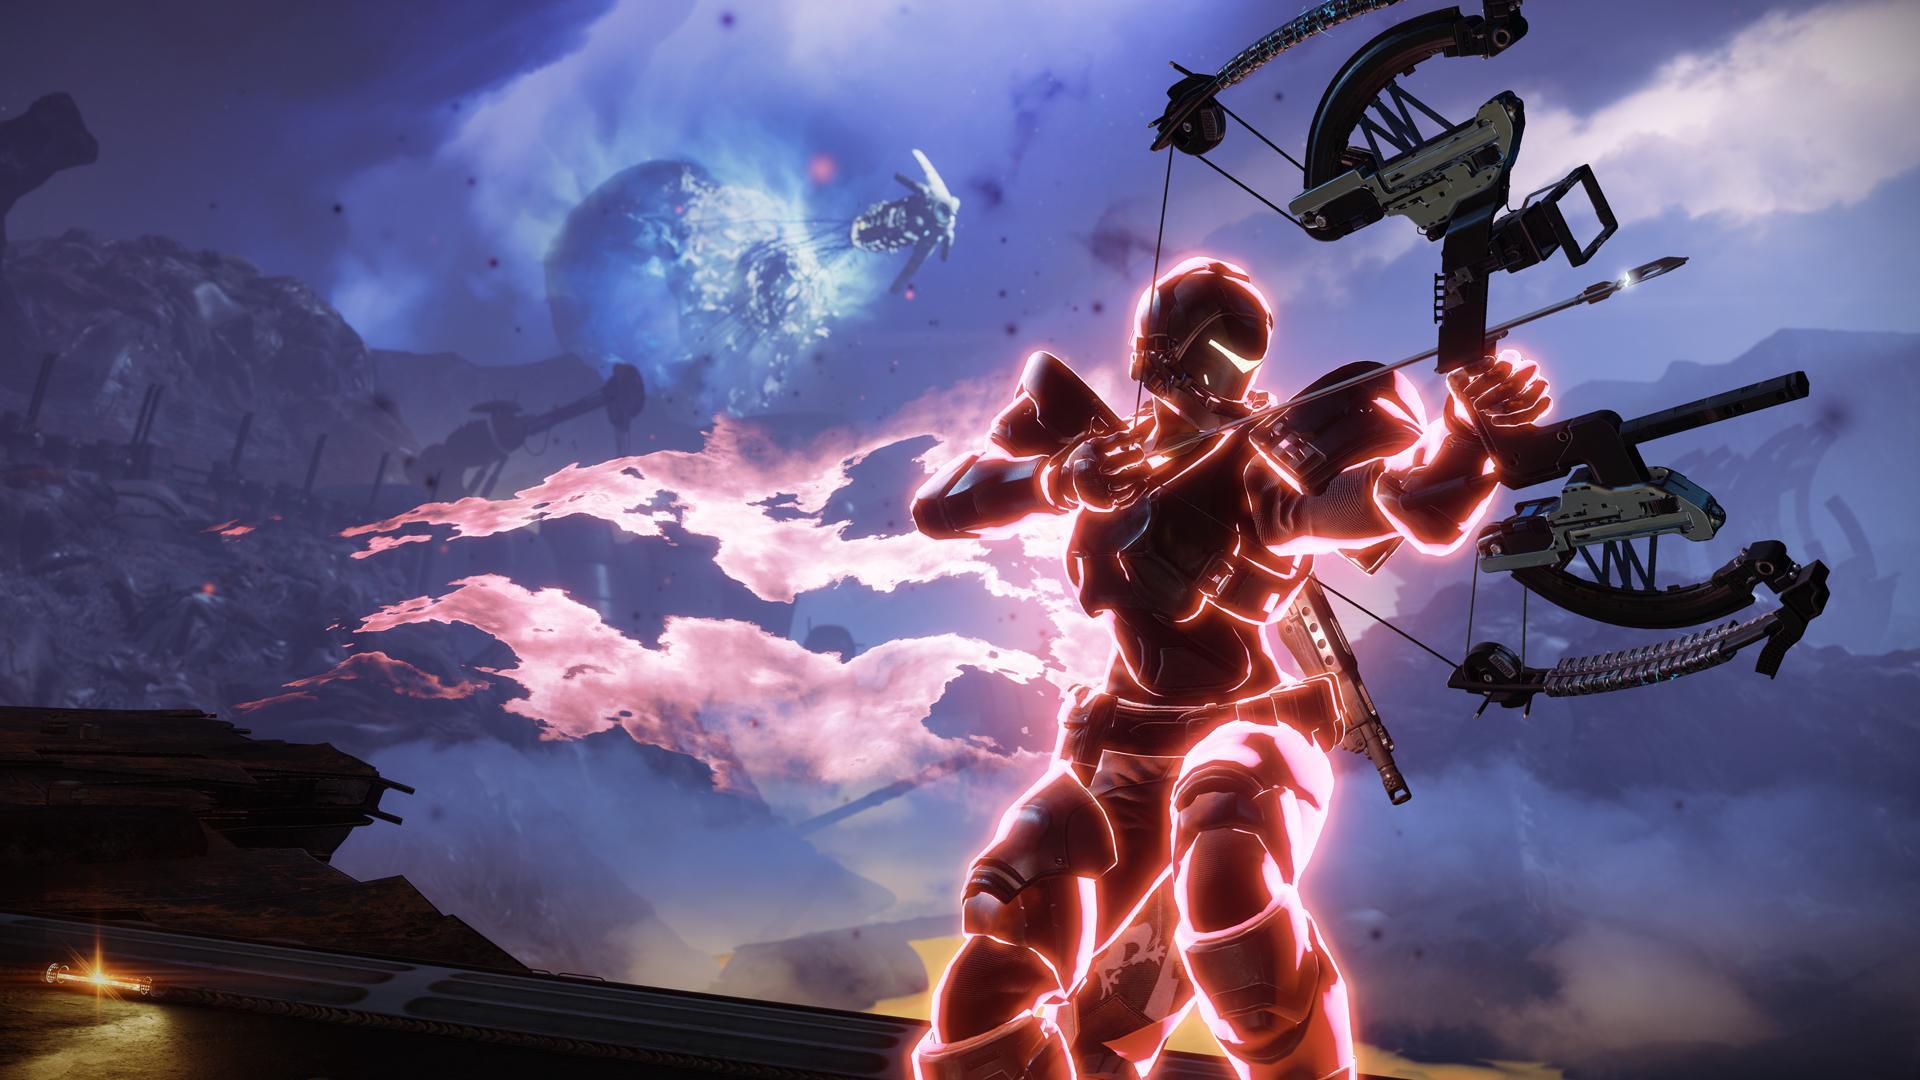 Destiny 2: Forsaken - How to Get a Bow - Guide - Push Square